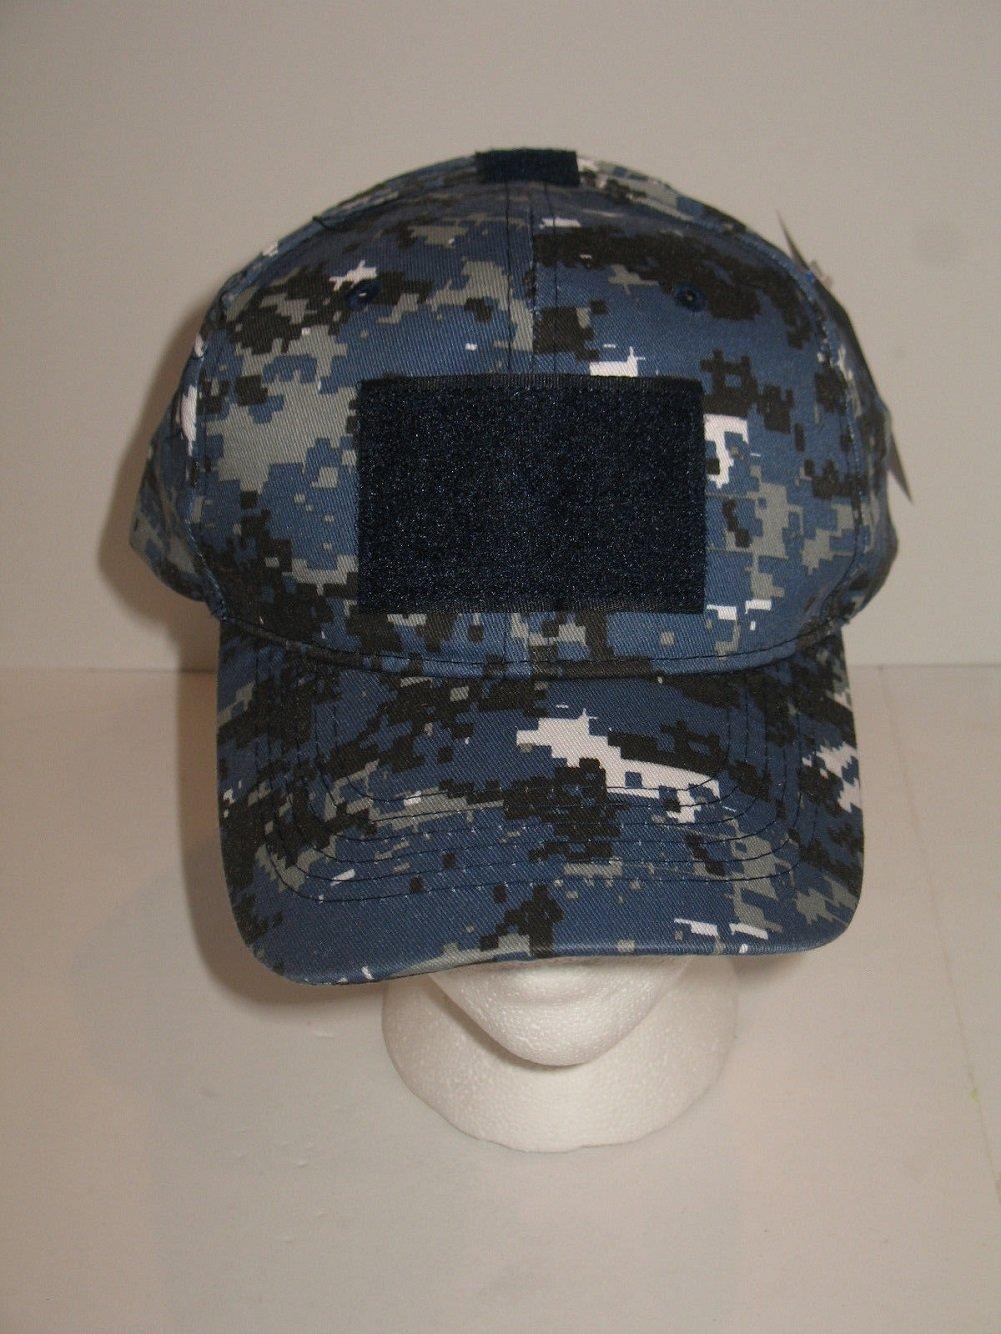 5d3d0b4732e ... buy amazon navy acu blue camo digital operator operators tactical cap  hat w velcro patch everything